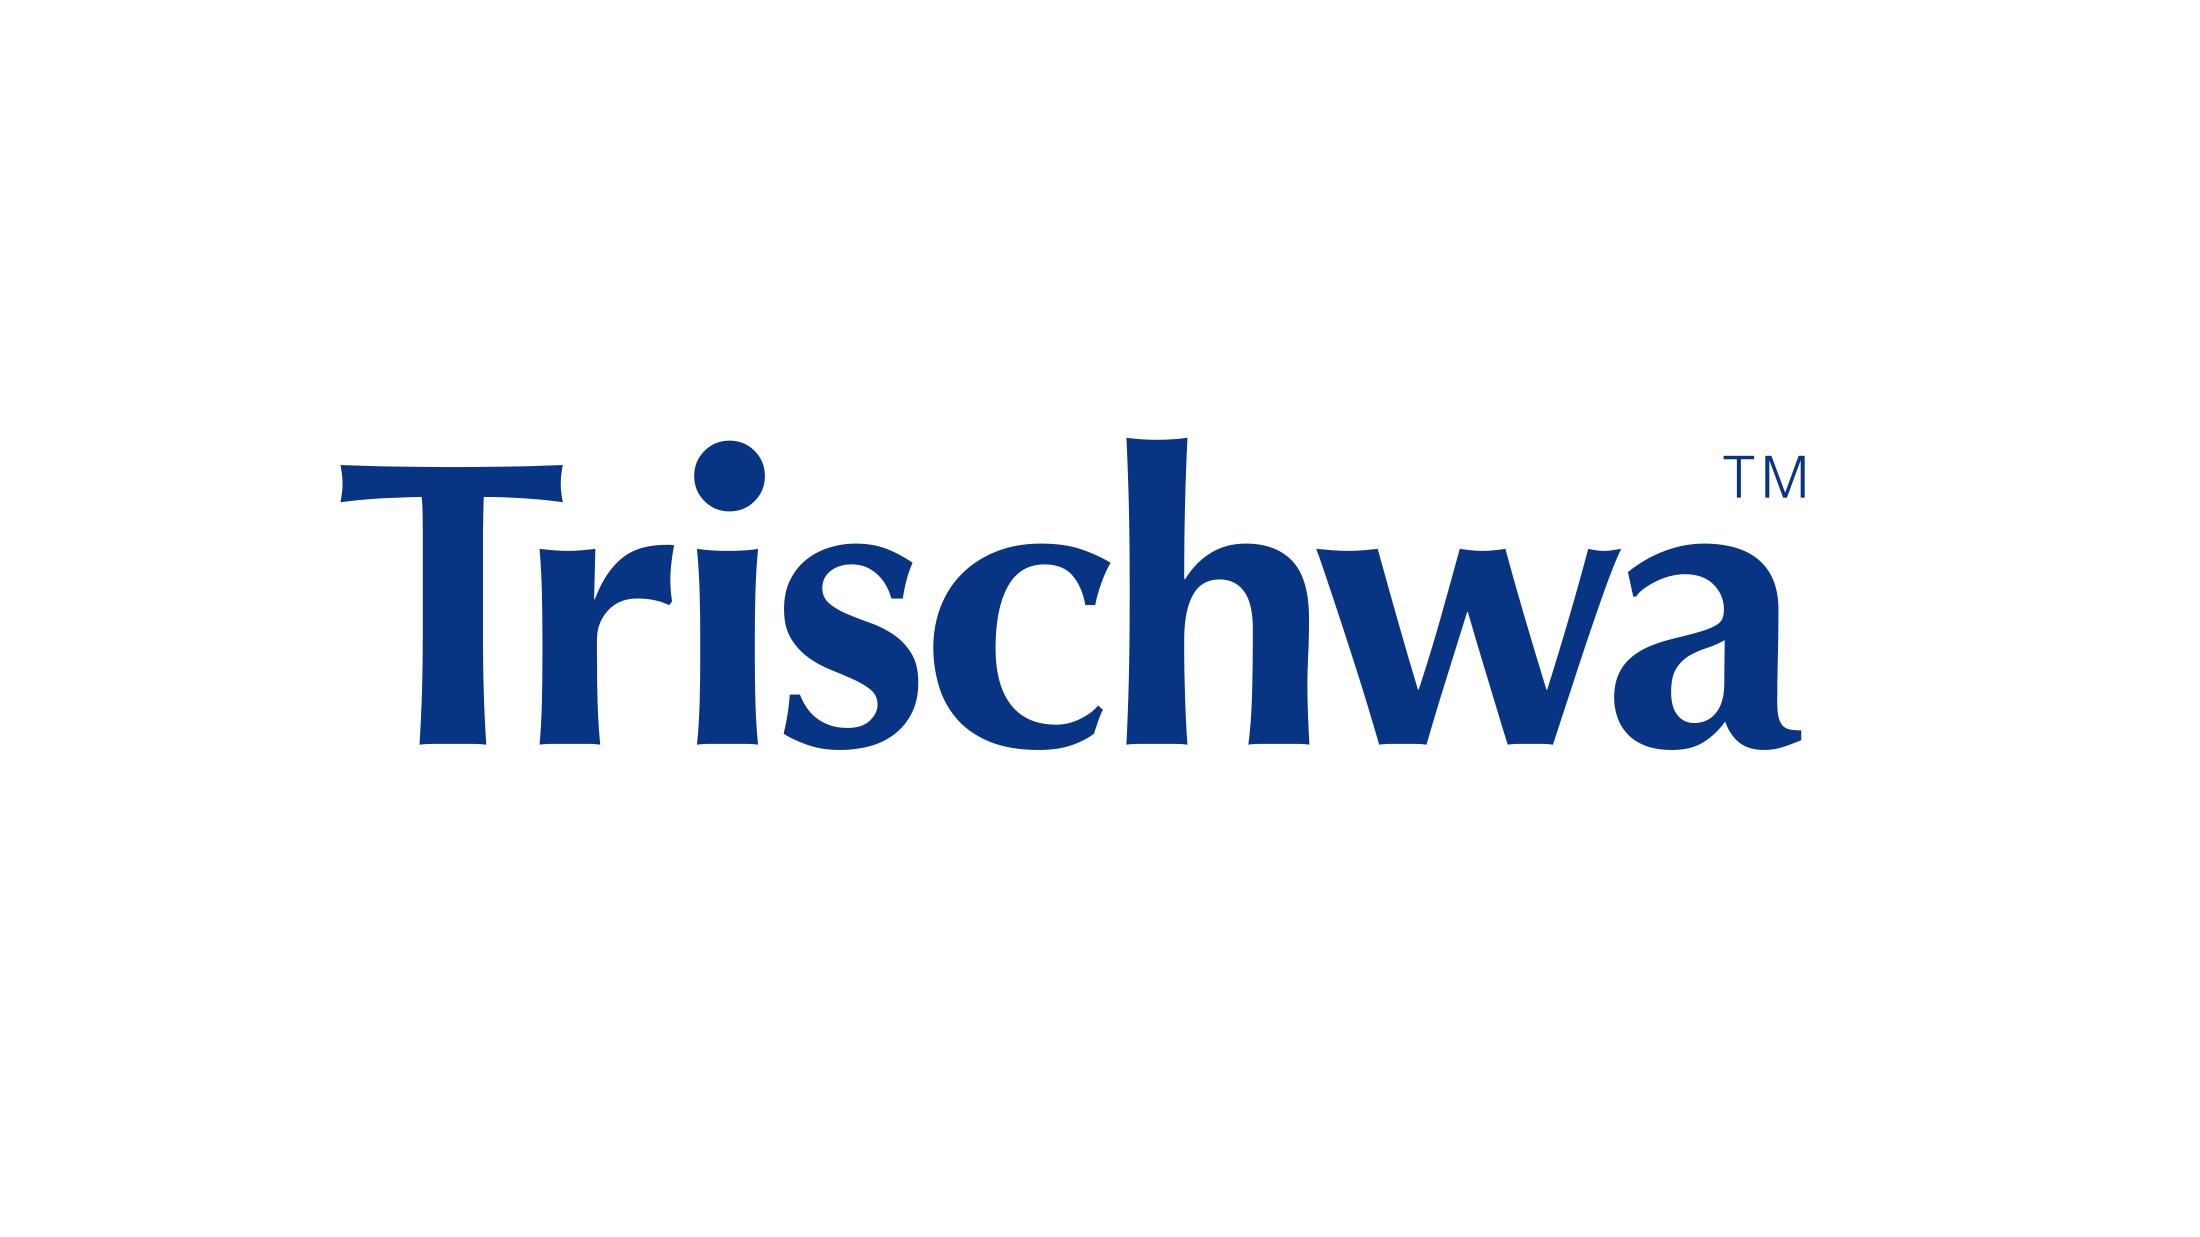 http://cdn.fnmnl.tv/wp-content/uploads/2016/09/23103057/Trischwa_logo-e1474594283704.png